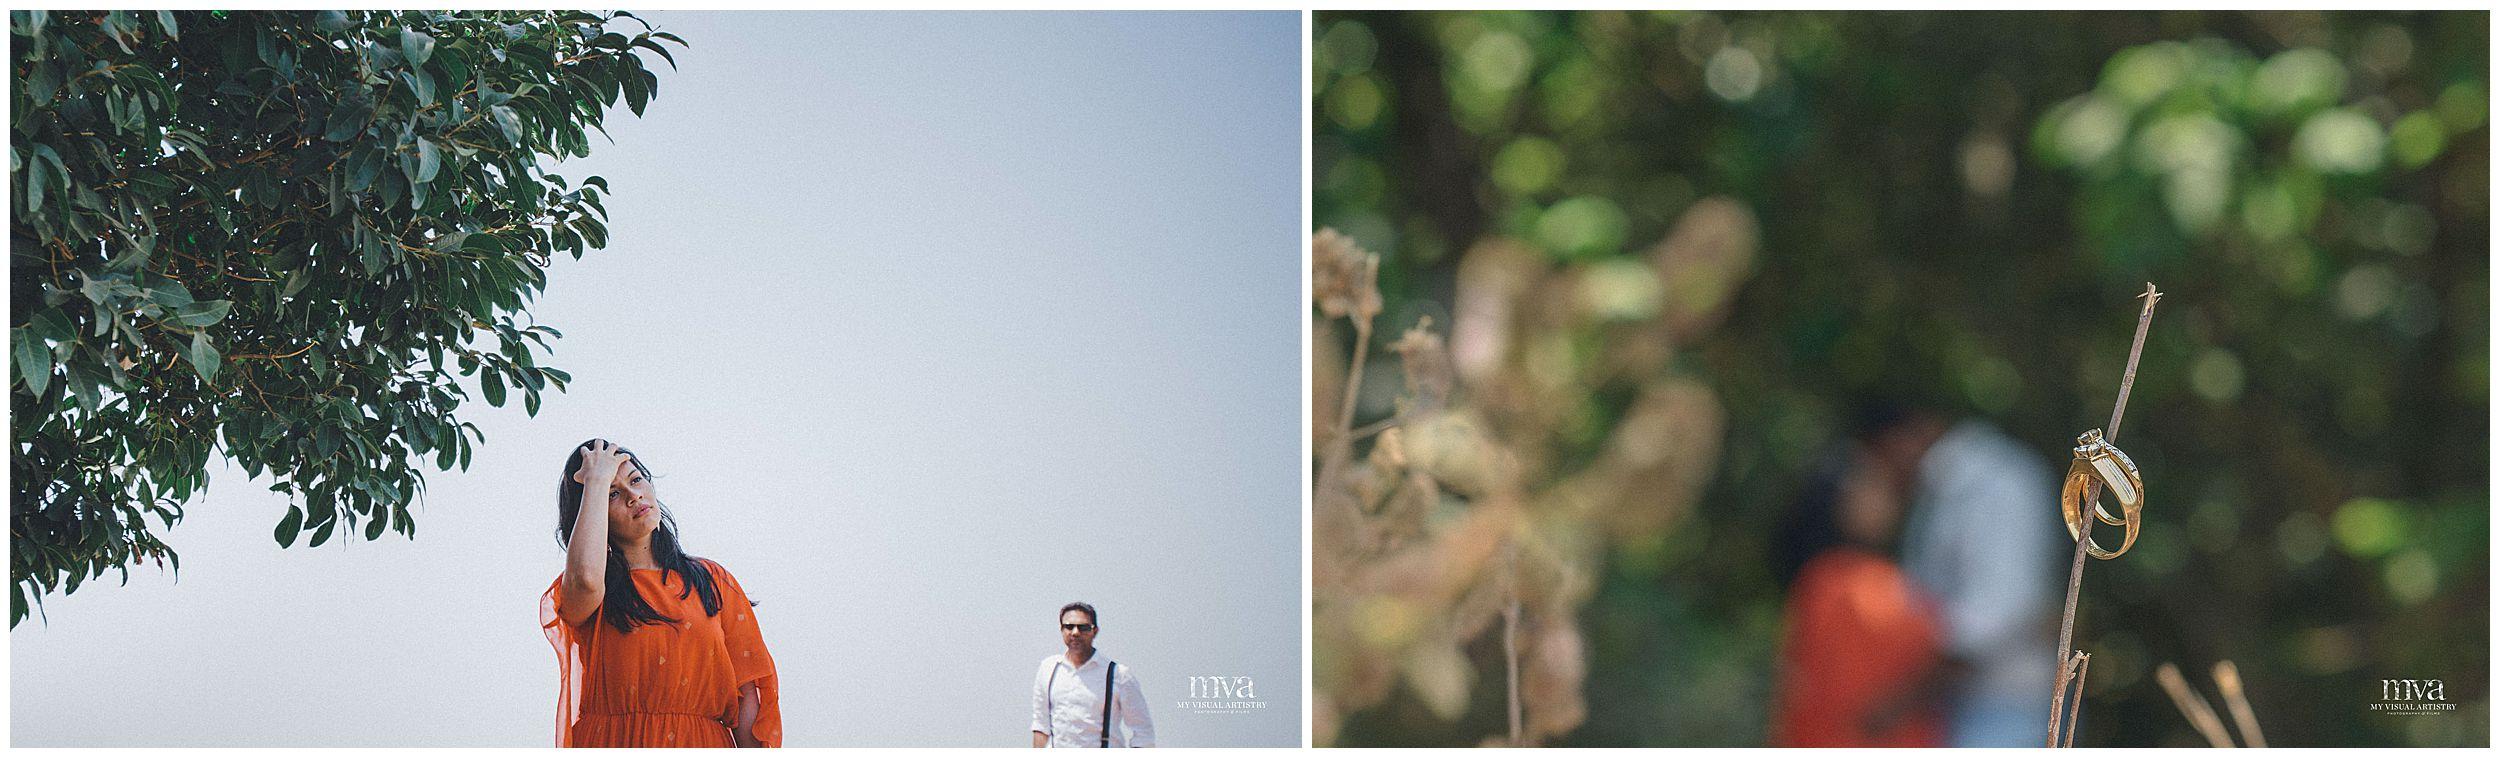 NIKKY_RAVI_MYVISUALARTISTRY_COUPLESHOOT_PREWEDDING_PHOTOGRAPHER_MVA_LONAVALA_DESTINATION_0011.jpg